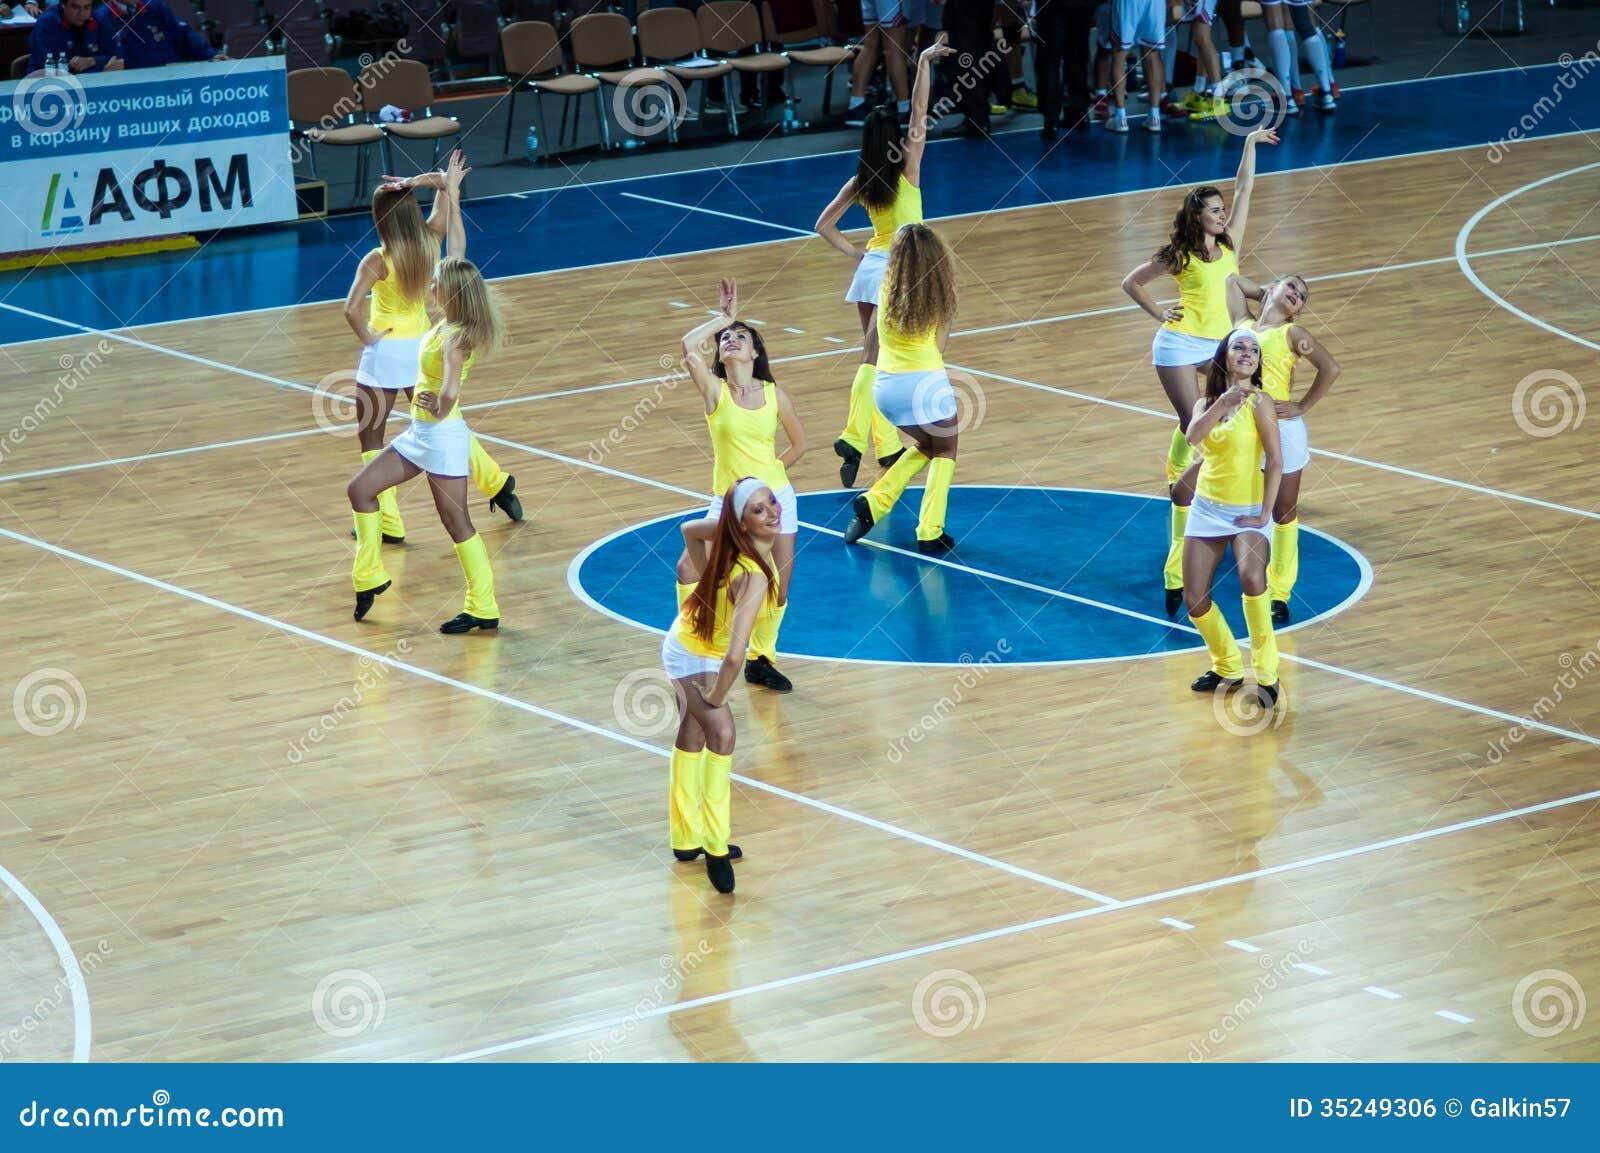 support team basketball